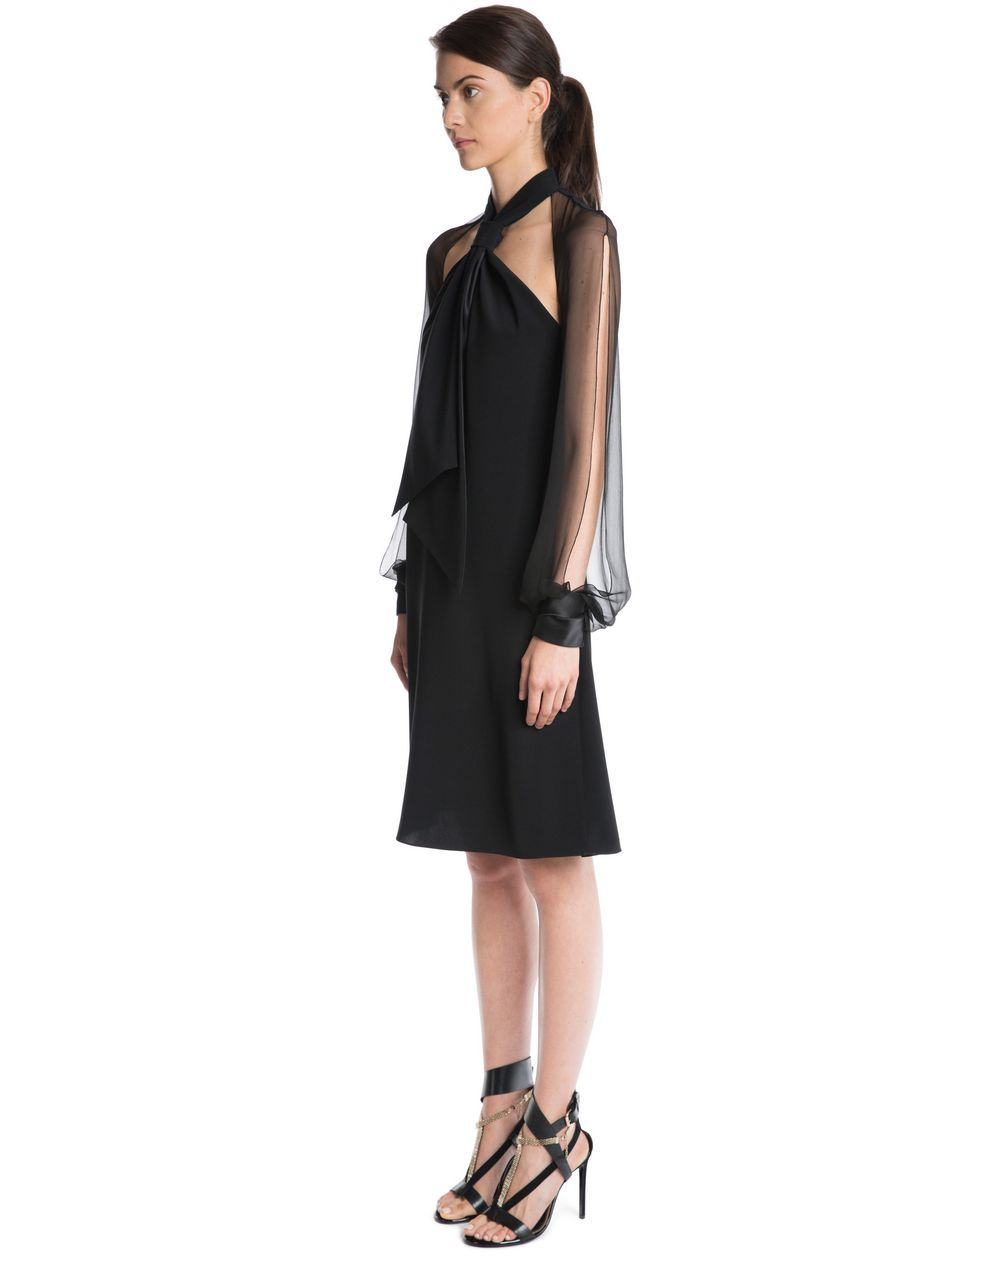 CHIFFON AND CREPE DE CHINE DRESS  - Lanvin